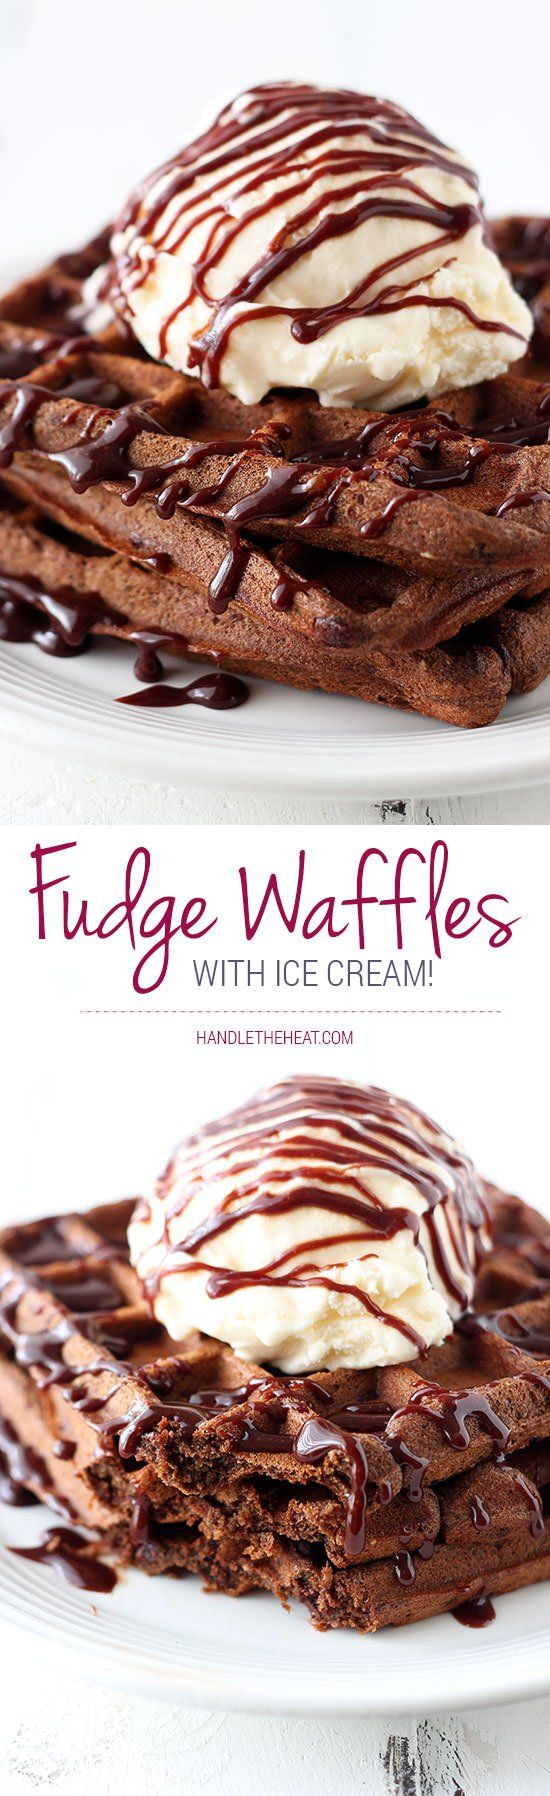 Slow Cooker: Fudge Waffles - Handle the Heat